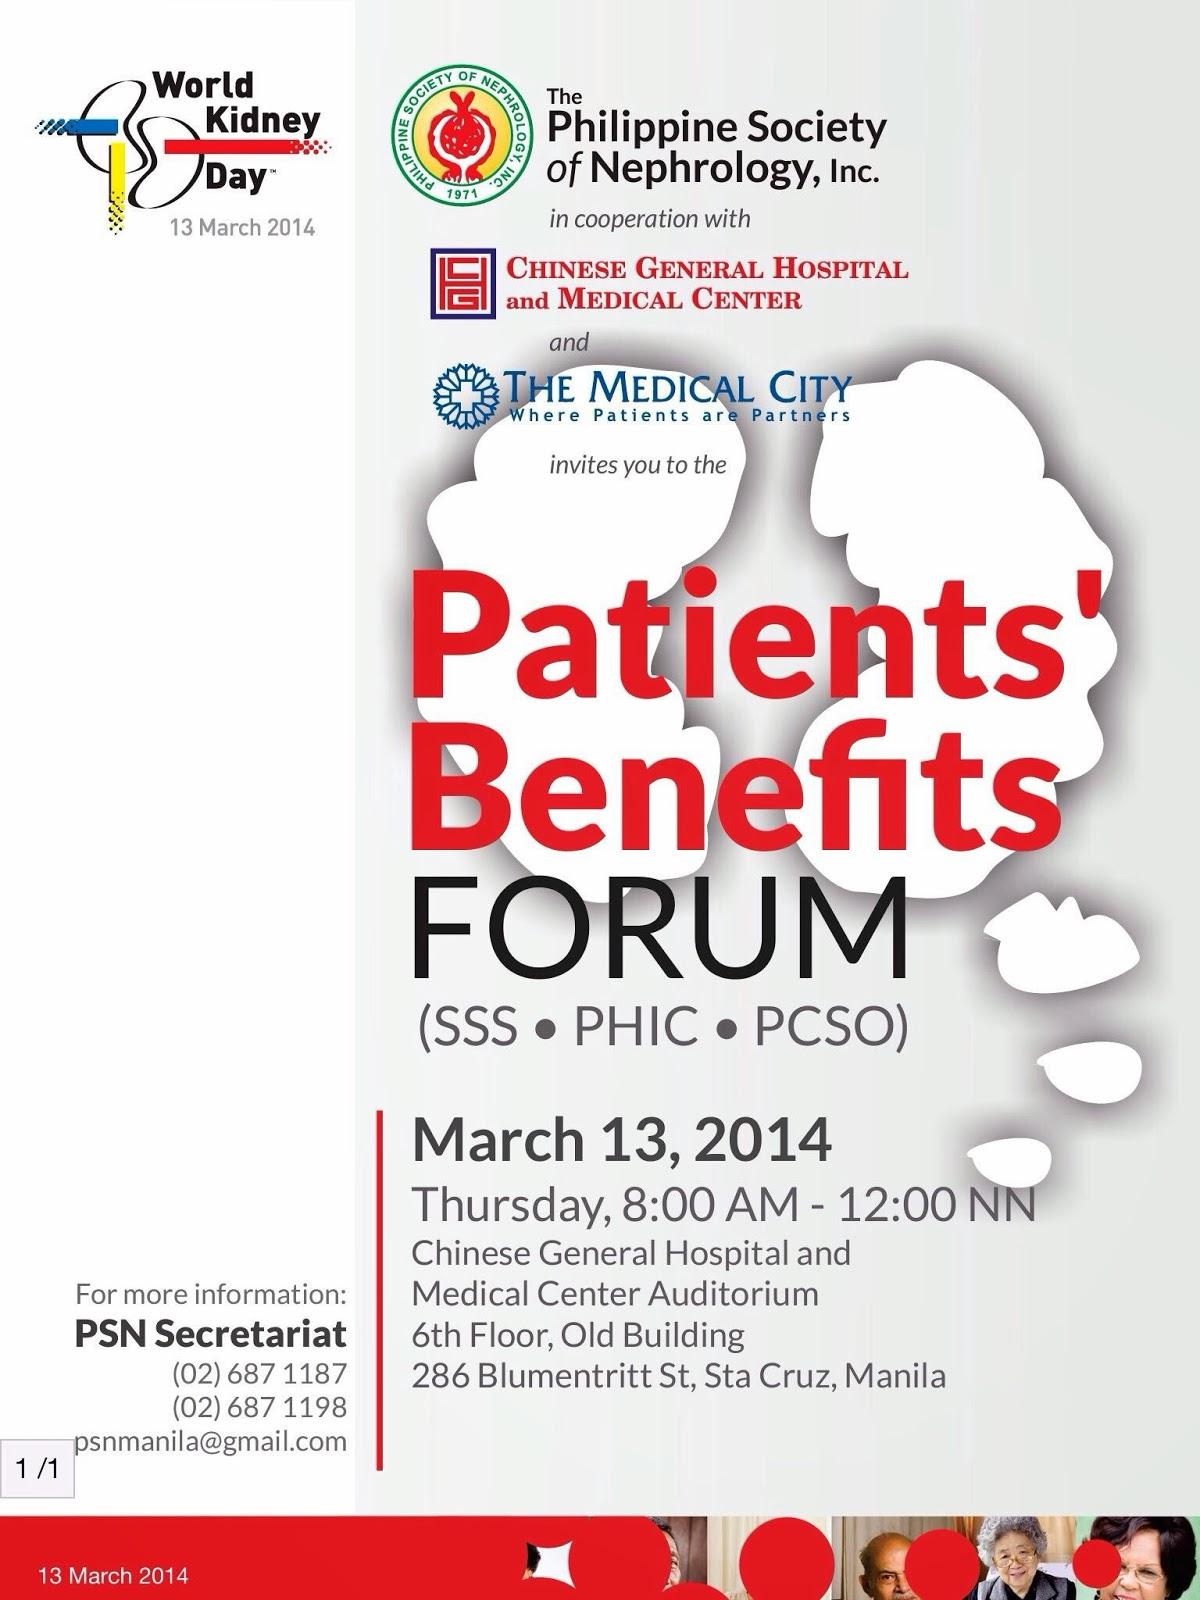 Patients Benefits Forum (SSS . PHIC . PCSO)